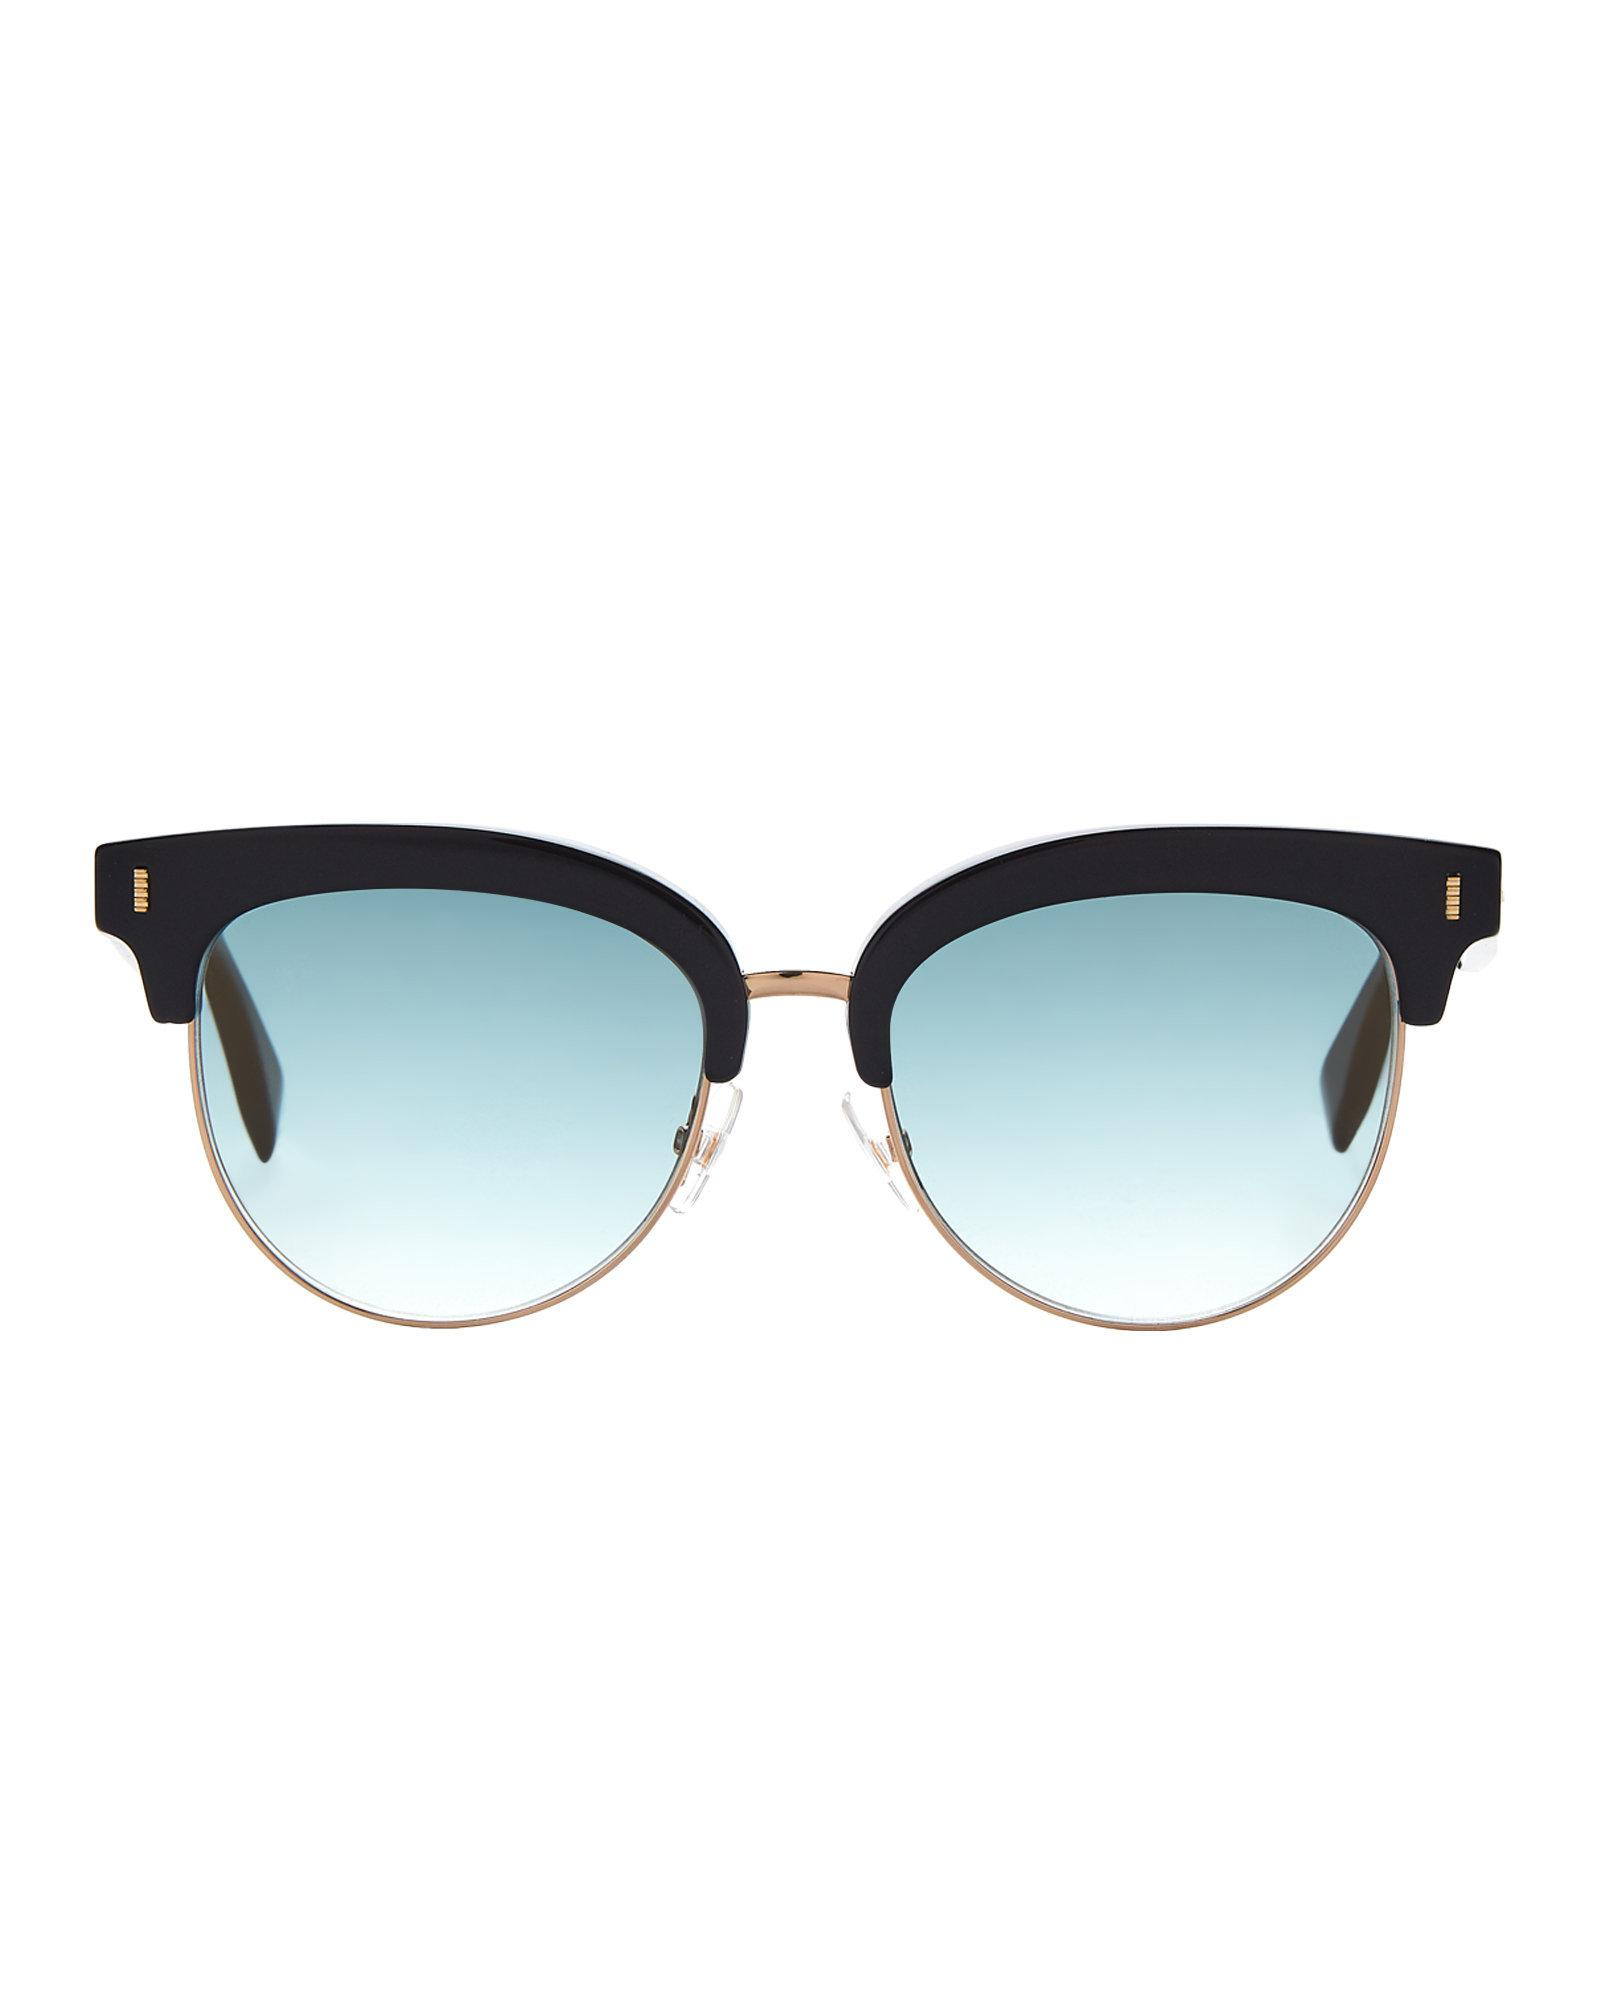 9001f8ec7d Fendi Mirrored Half-rim Sunglasses in Black - Lyst